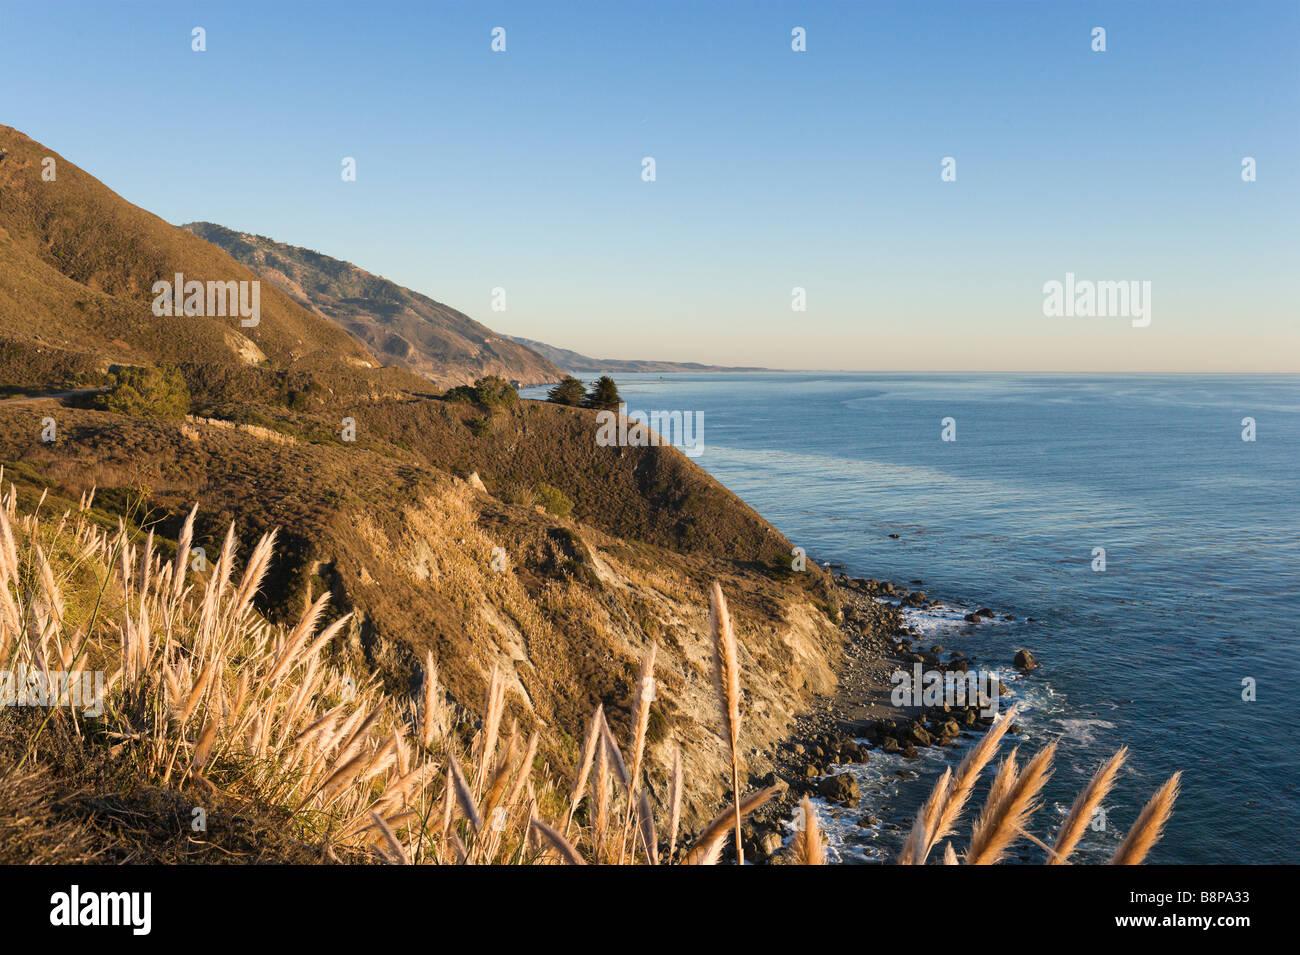 Costa poco prima del tramonto, Pacific Coast Highway (Autostrada 1) vicino Gorda, Big Sur Costa, California centrale, Foto Stock